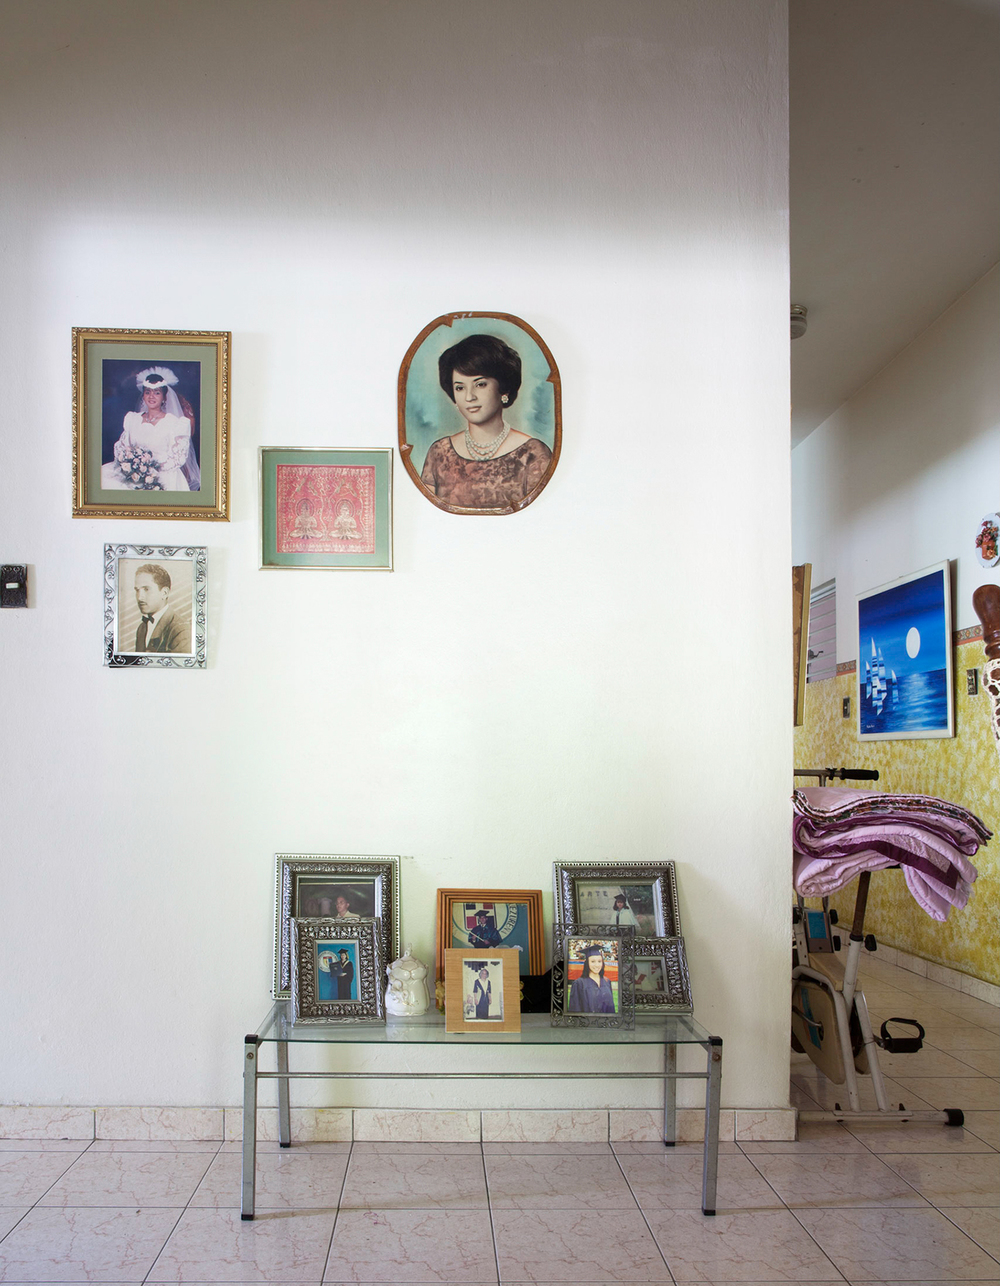 Tia Chea's Foyer, 2010. Gazcue, Santo Domingo, R.D.